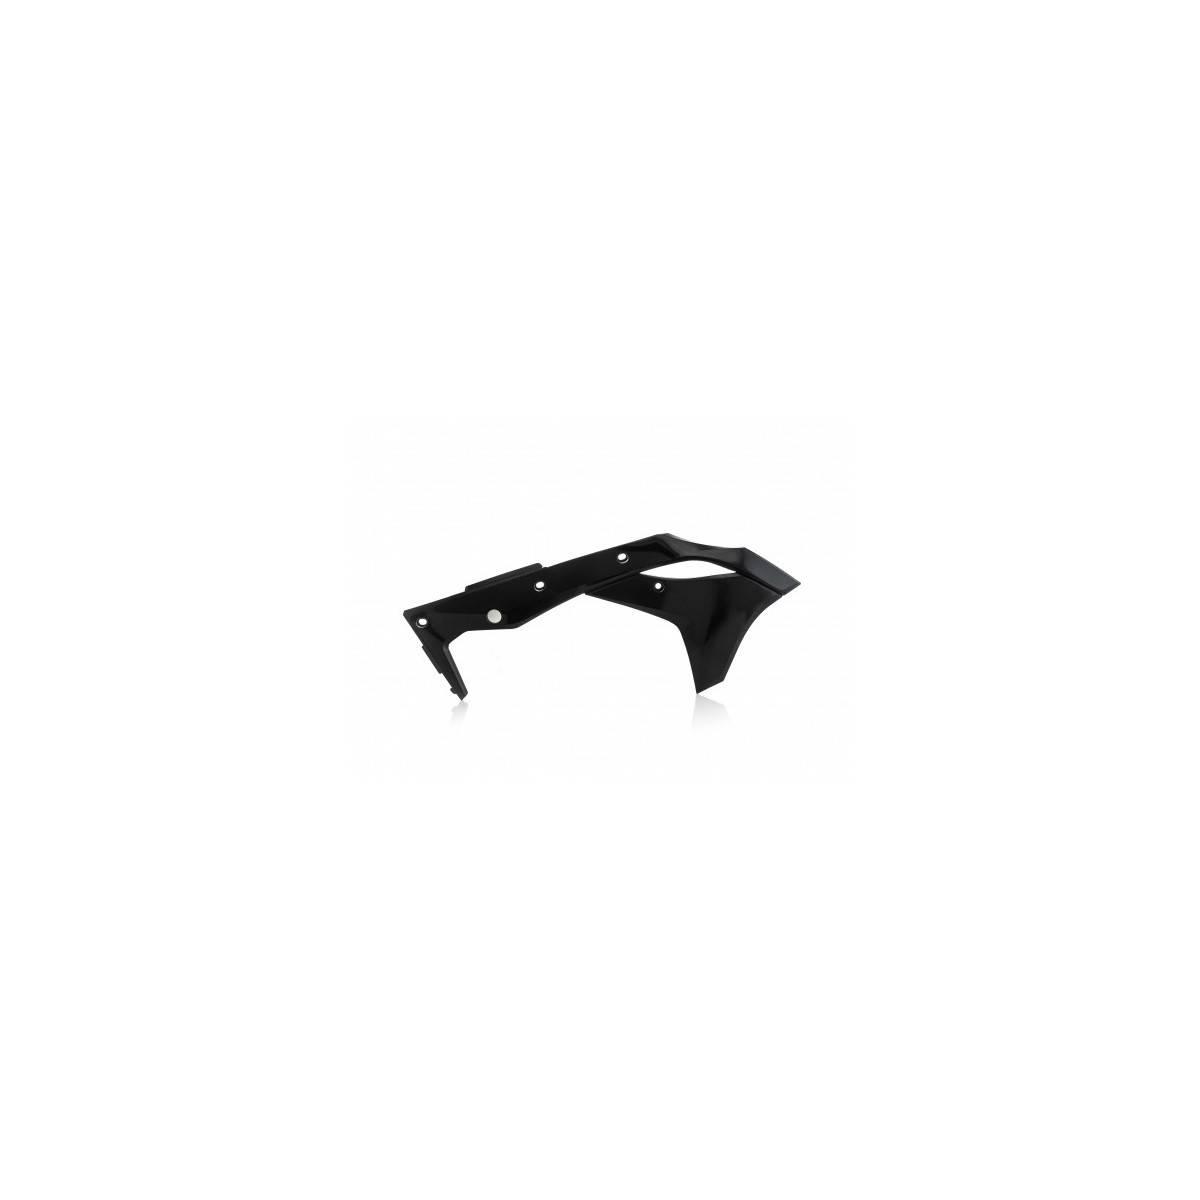 0022376-090 - Tapa Radiador Kx-F 250 17 18 Negro